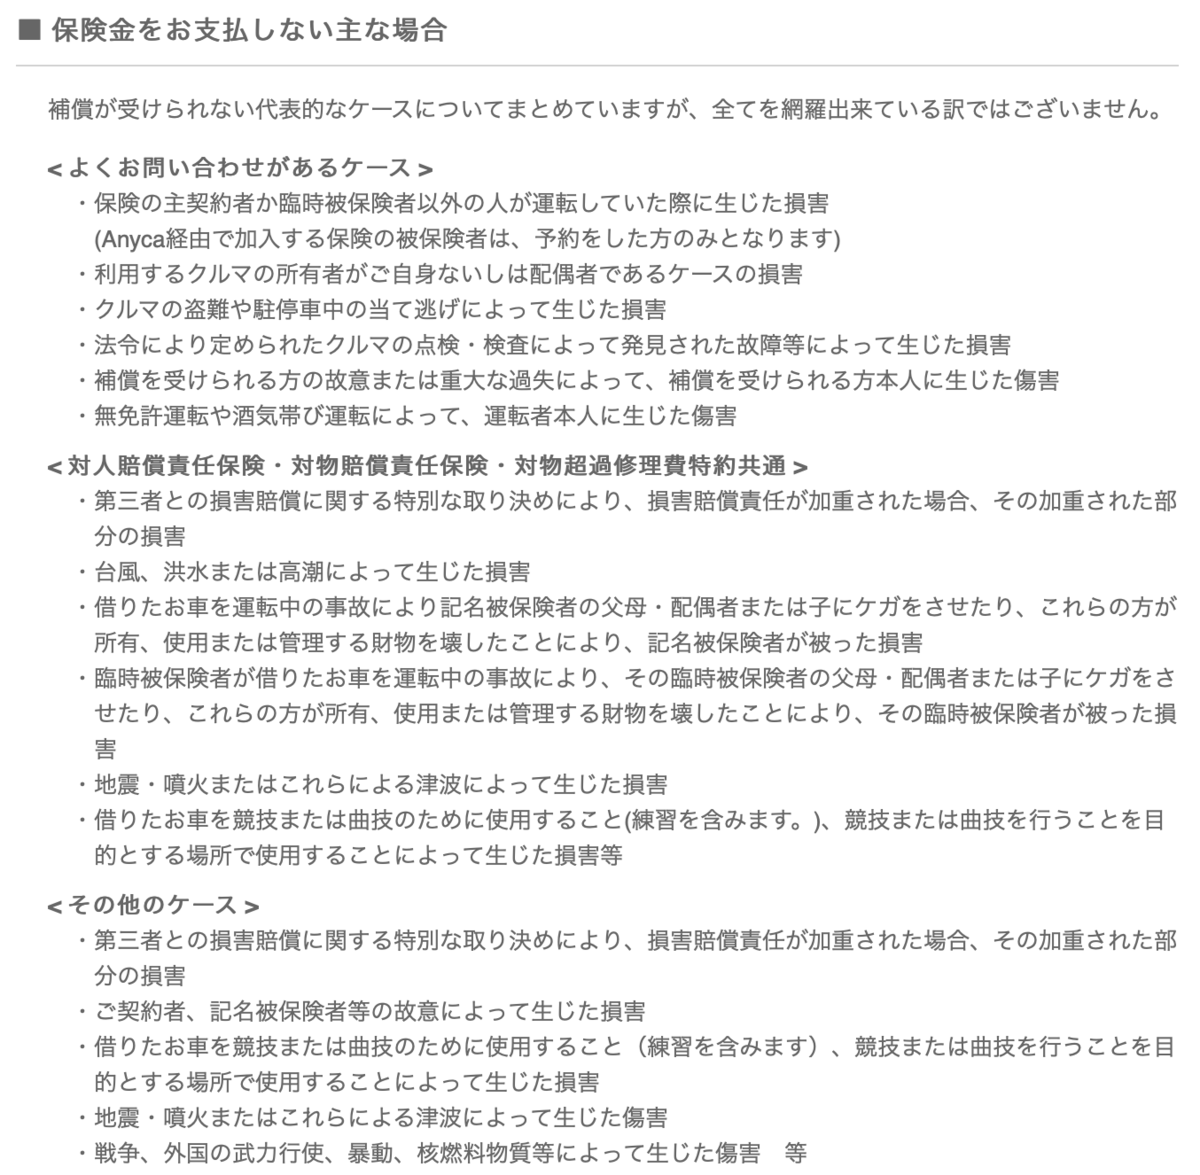 f:id:sugisan_san:20190316140346p:plain